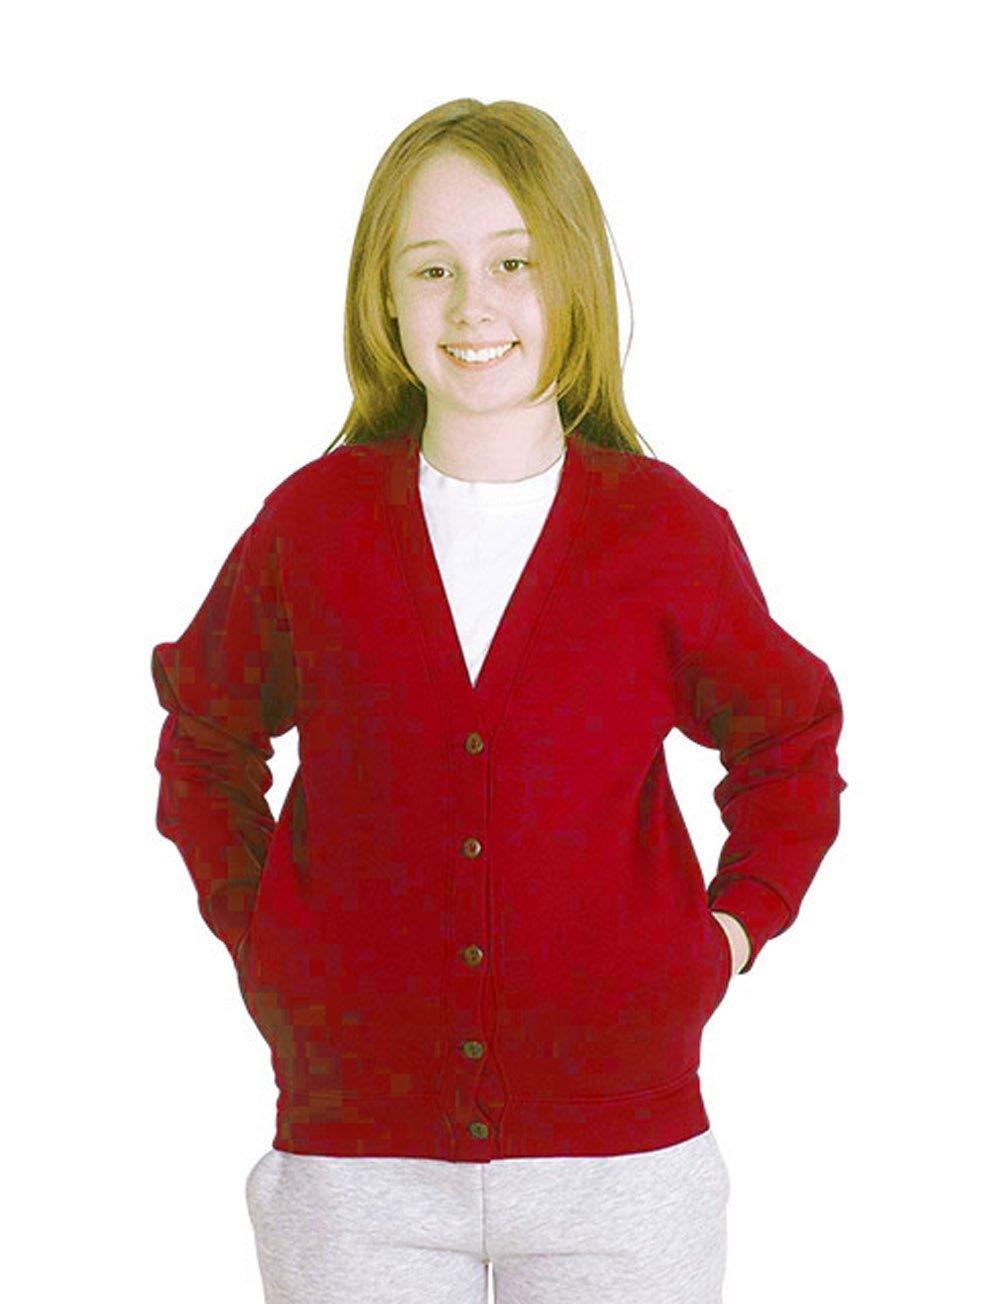 Girls Cardigan School Uniform Kids Premium Sweater Sweatshirt Age 2 to 13